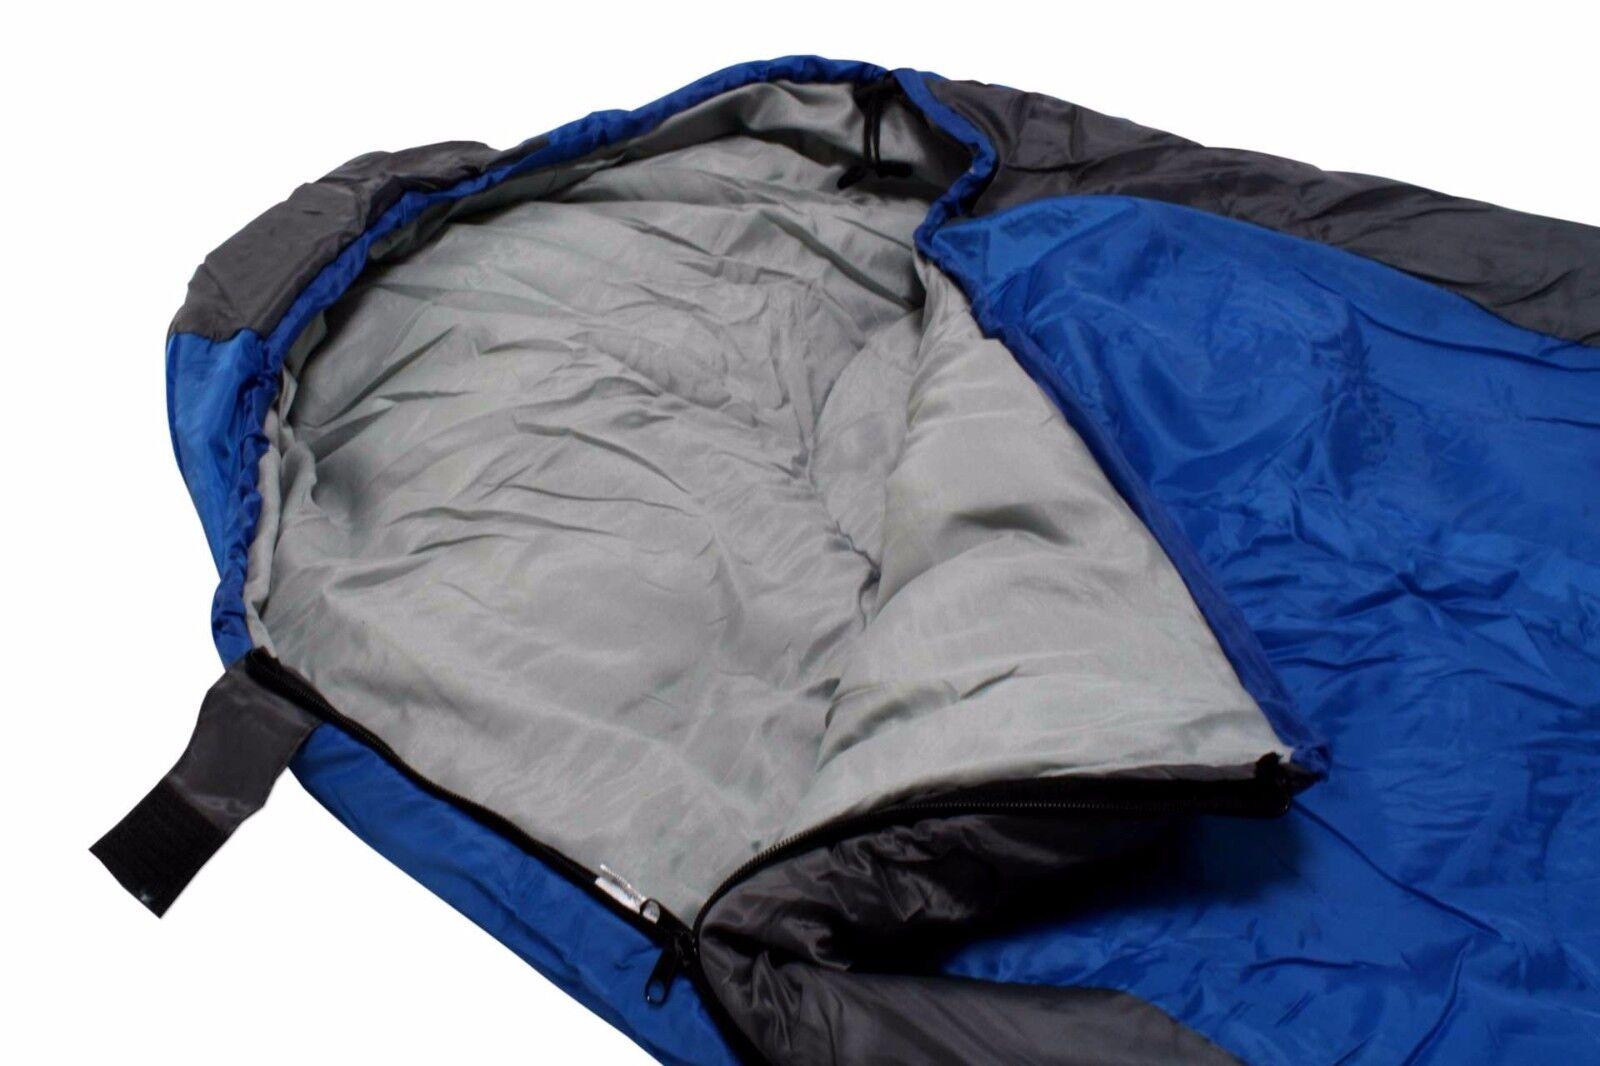 schlafsack yaluta camping mumienschlafsack 2 farben. Black Bedroom Furniture Sets. Home Design Ideas